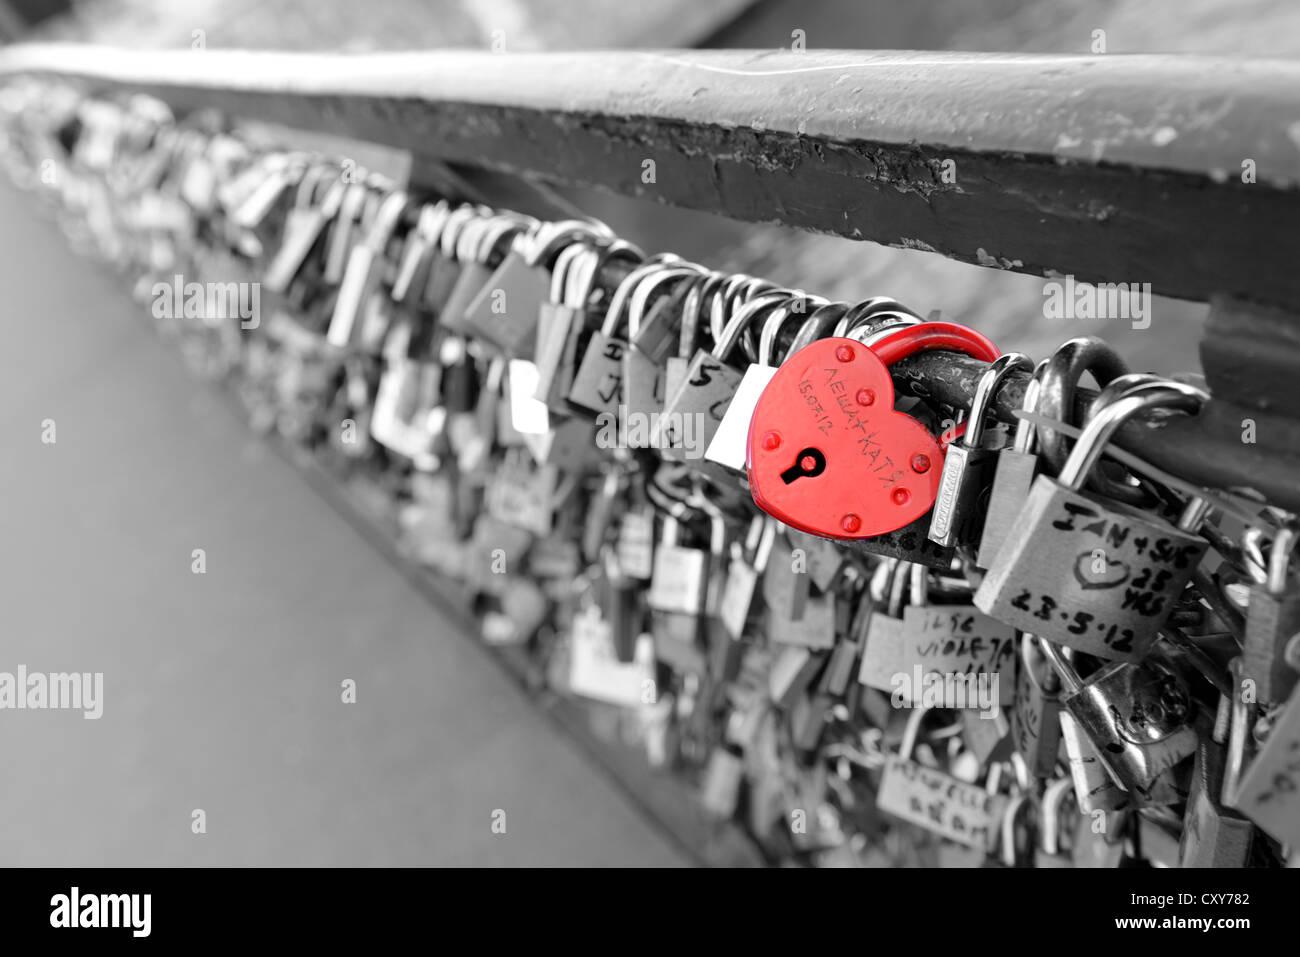 Lover's padlocks which adorn many bridges in Paris, France, red heart padlock monochrome background, love locks - Stock Image